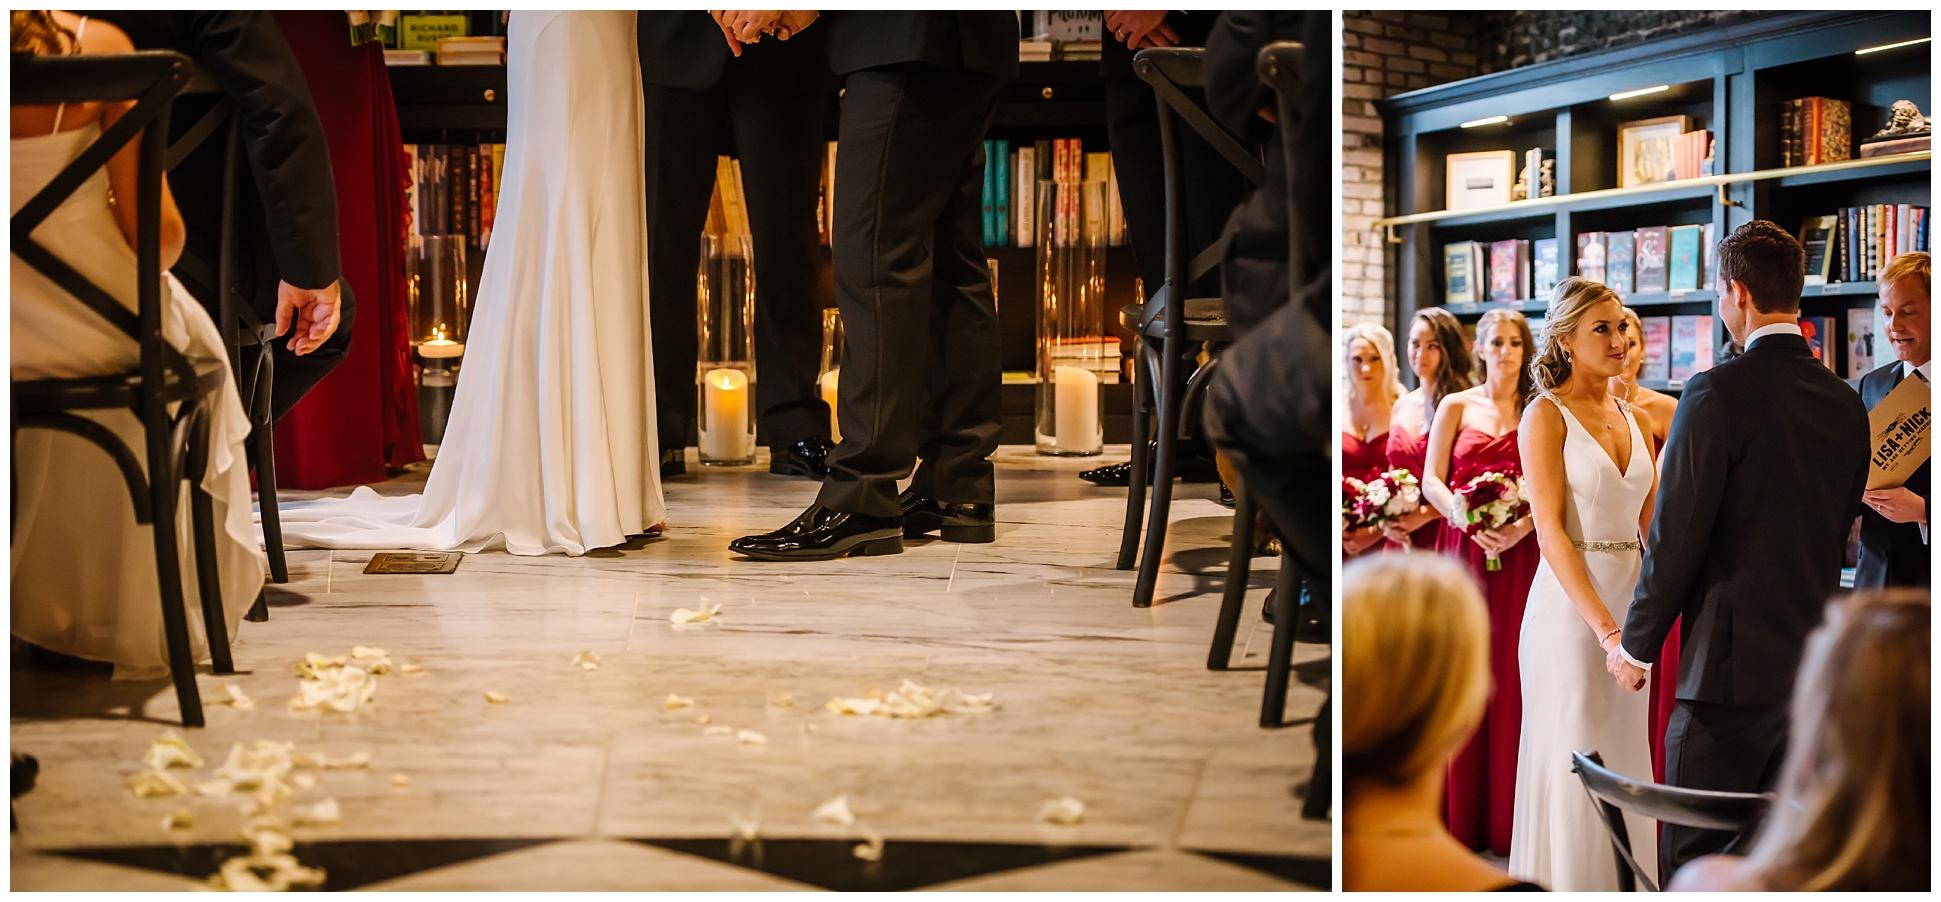 Oxford-exchange-wedding-photogapher-garland-candels-bookstore-burgandy-botanica_0048.jpg